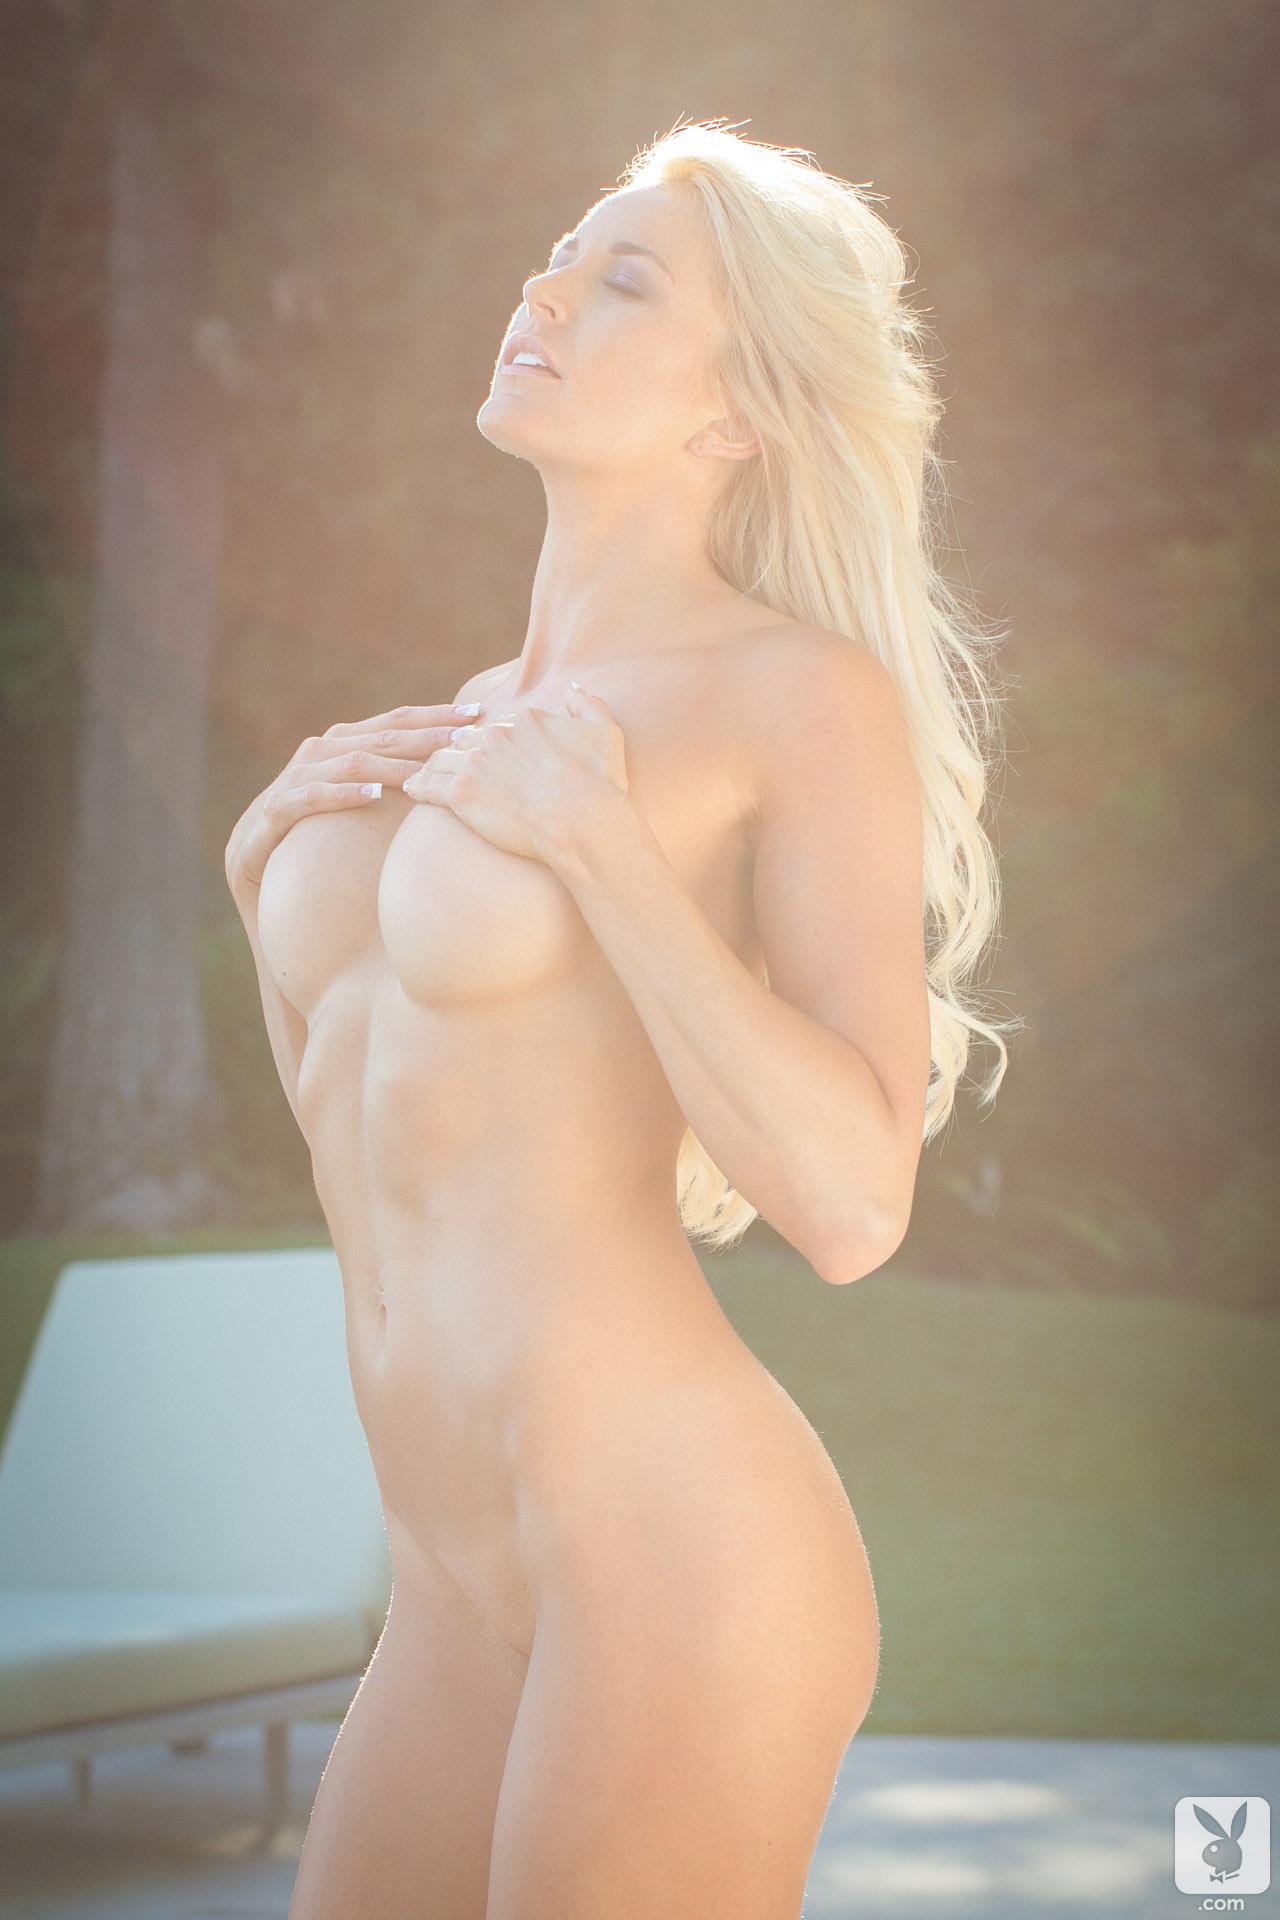 lindsay-love-bikini-playboy-16